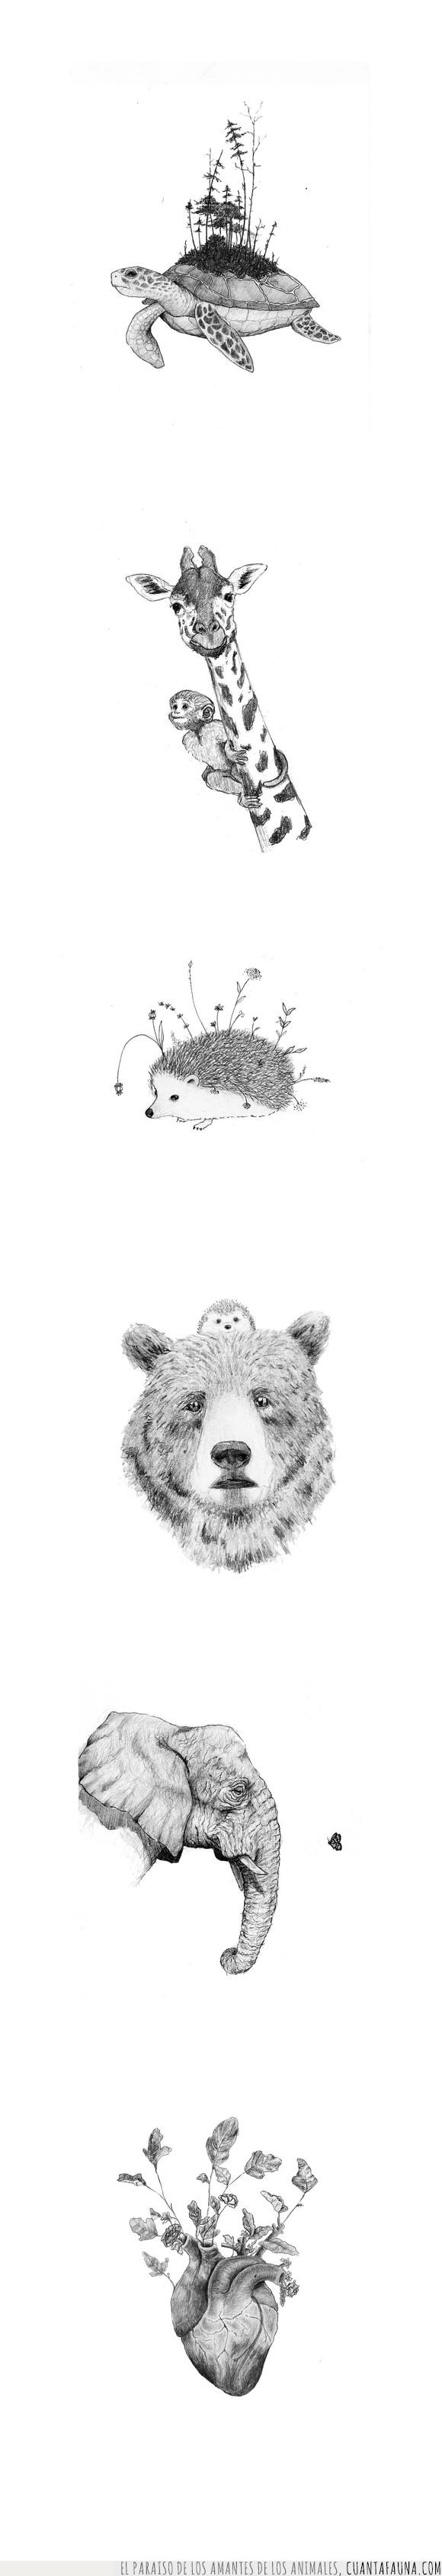 amigos,animales,arte,belleza,blancoynegro,corazón,dibujo,elefante,erizo,flores,ilustración,lápiz,mariposa,naturaleza,oso,tortuga